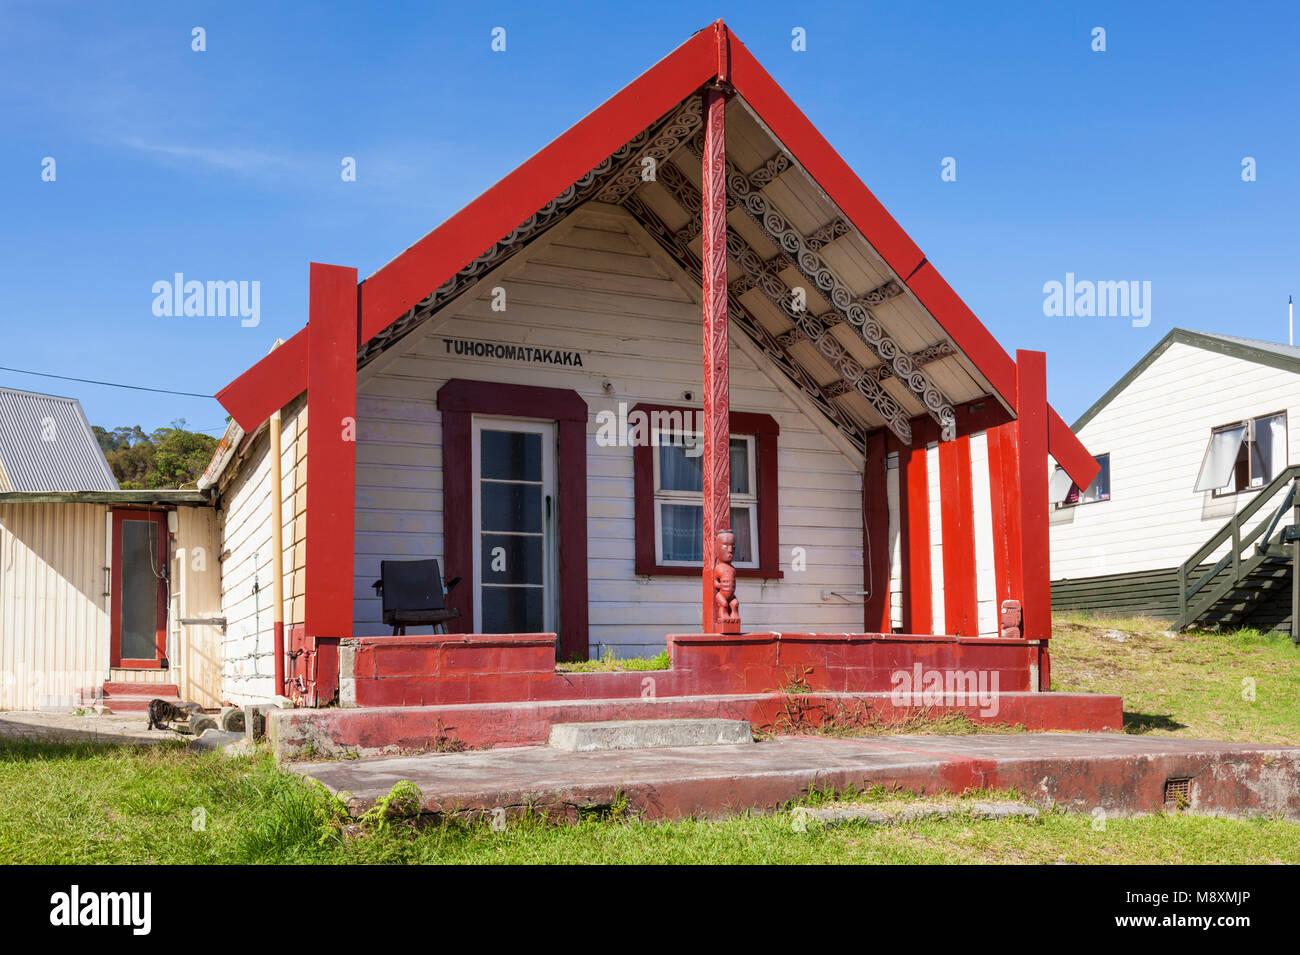 Nuova Zelanda Rotorua Nuova Zelanda whakarewarewa thermal village casa Tuhoromatakaka maggie papakura's house Immagini Stock